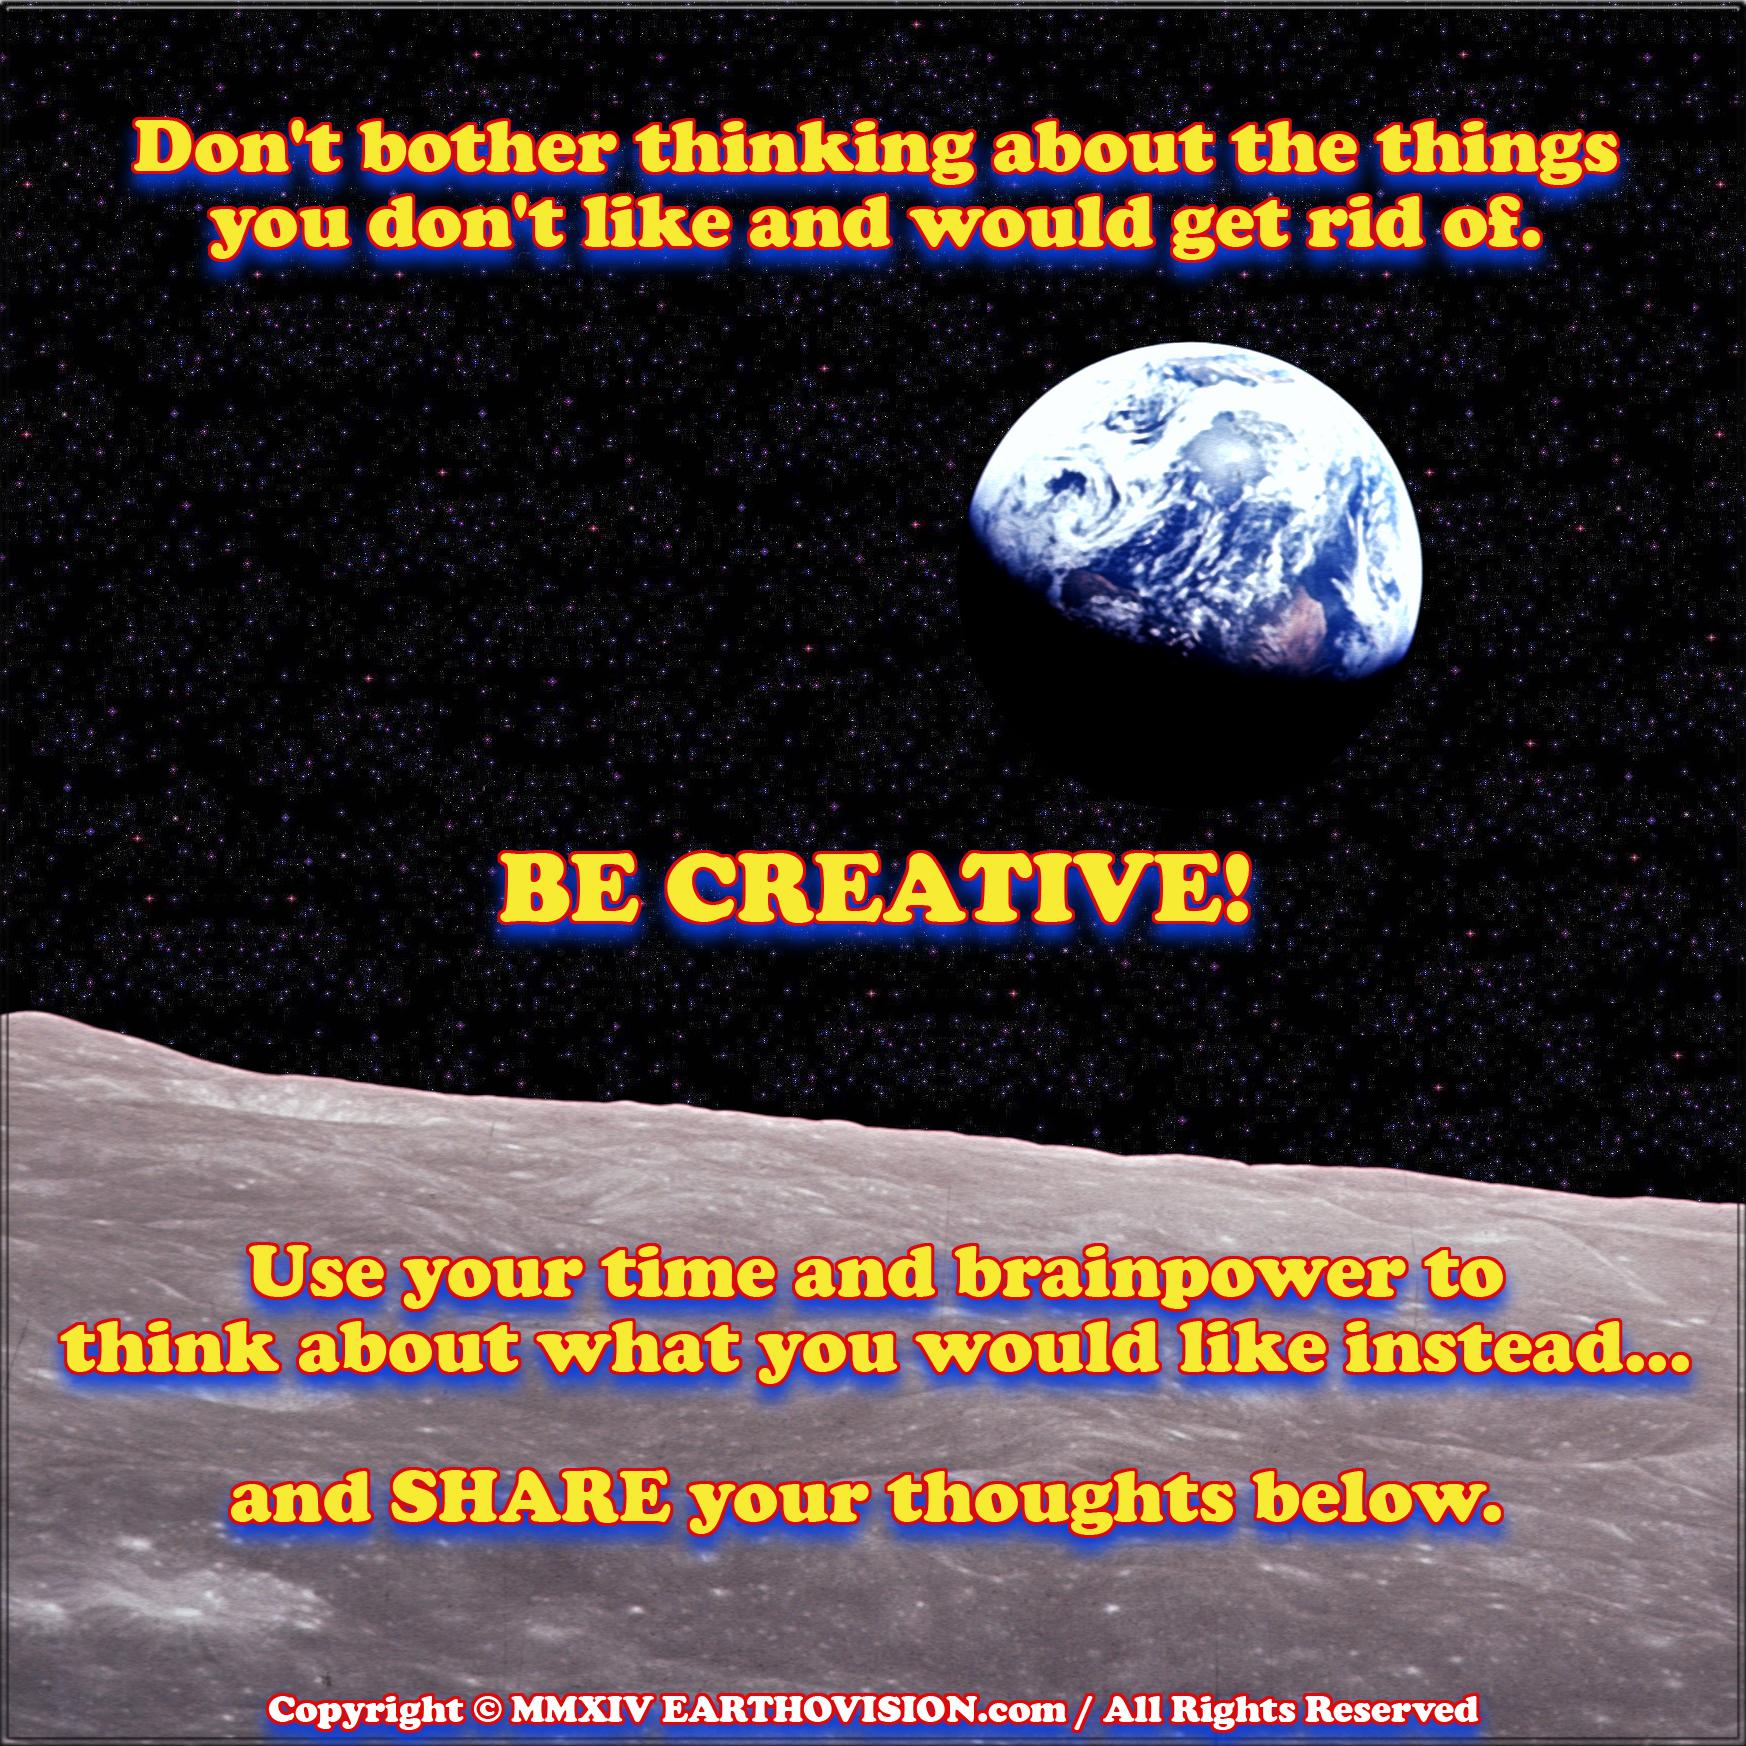 BeCreative-001